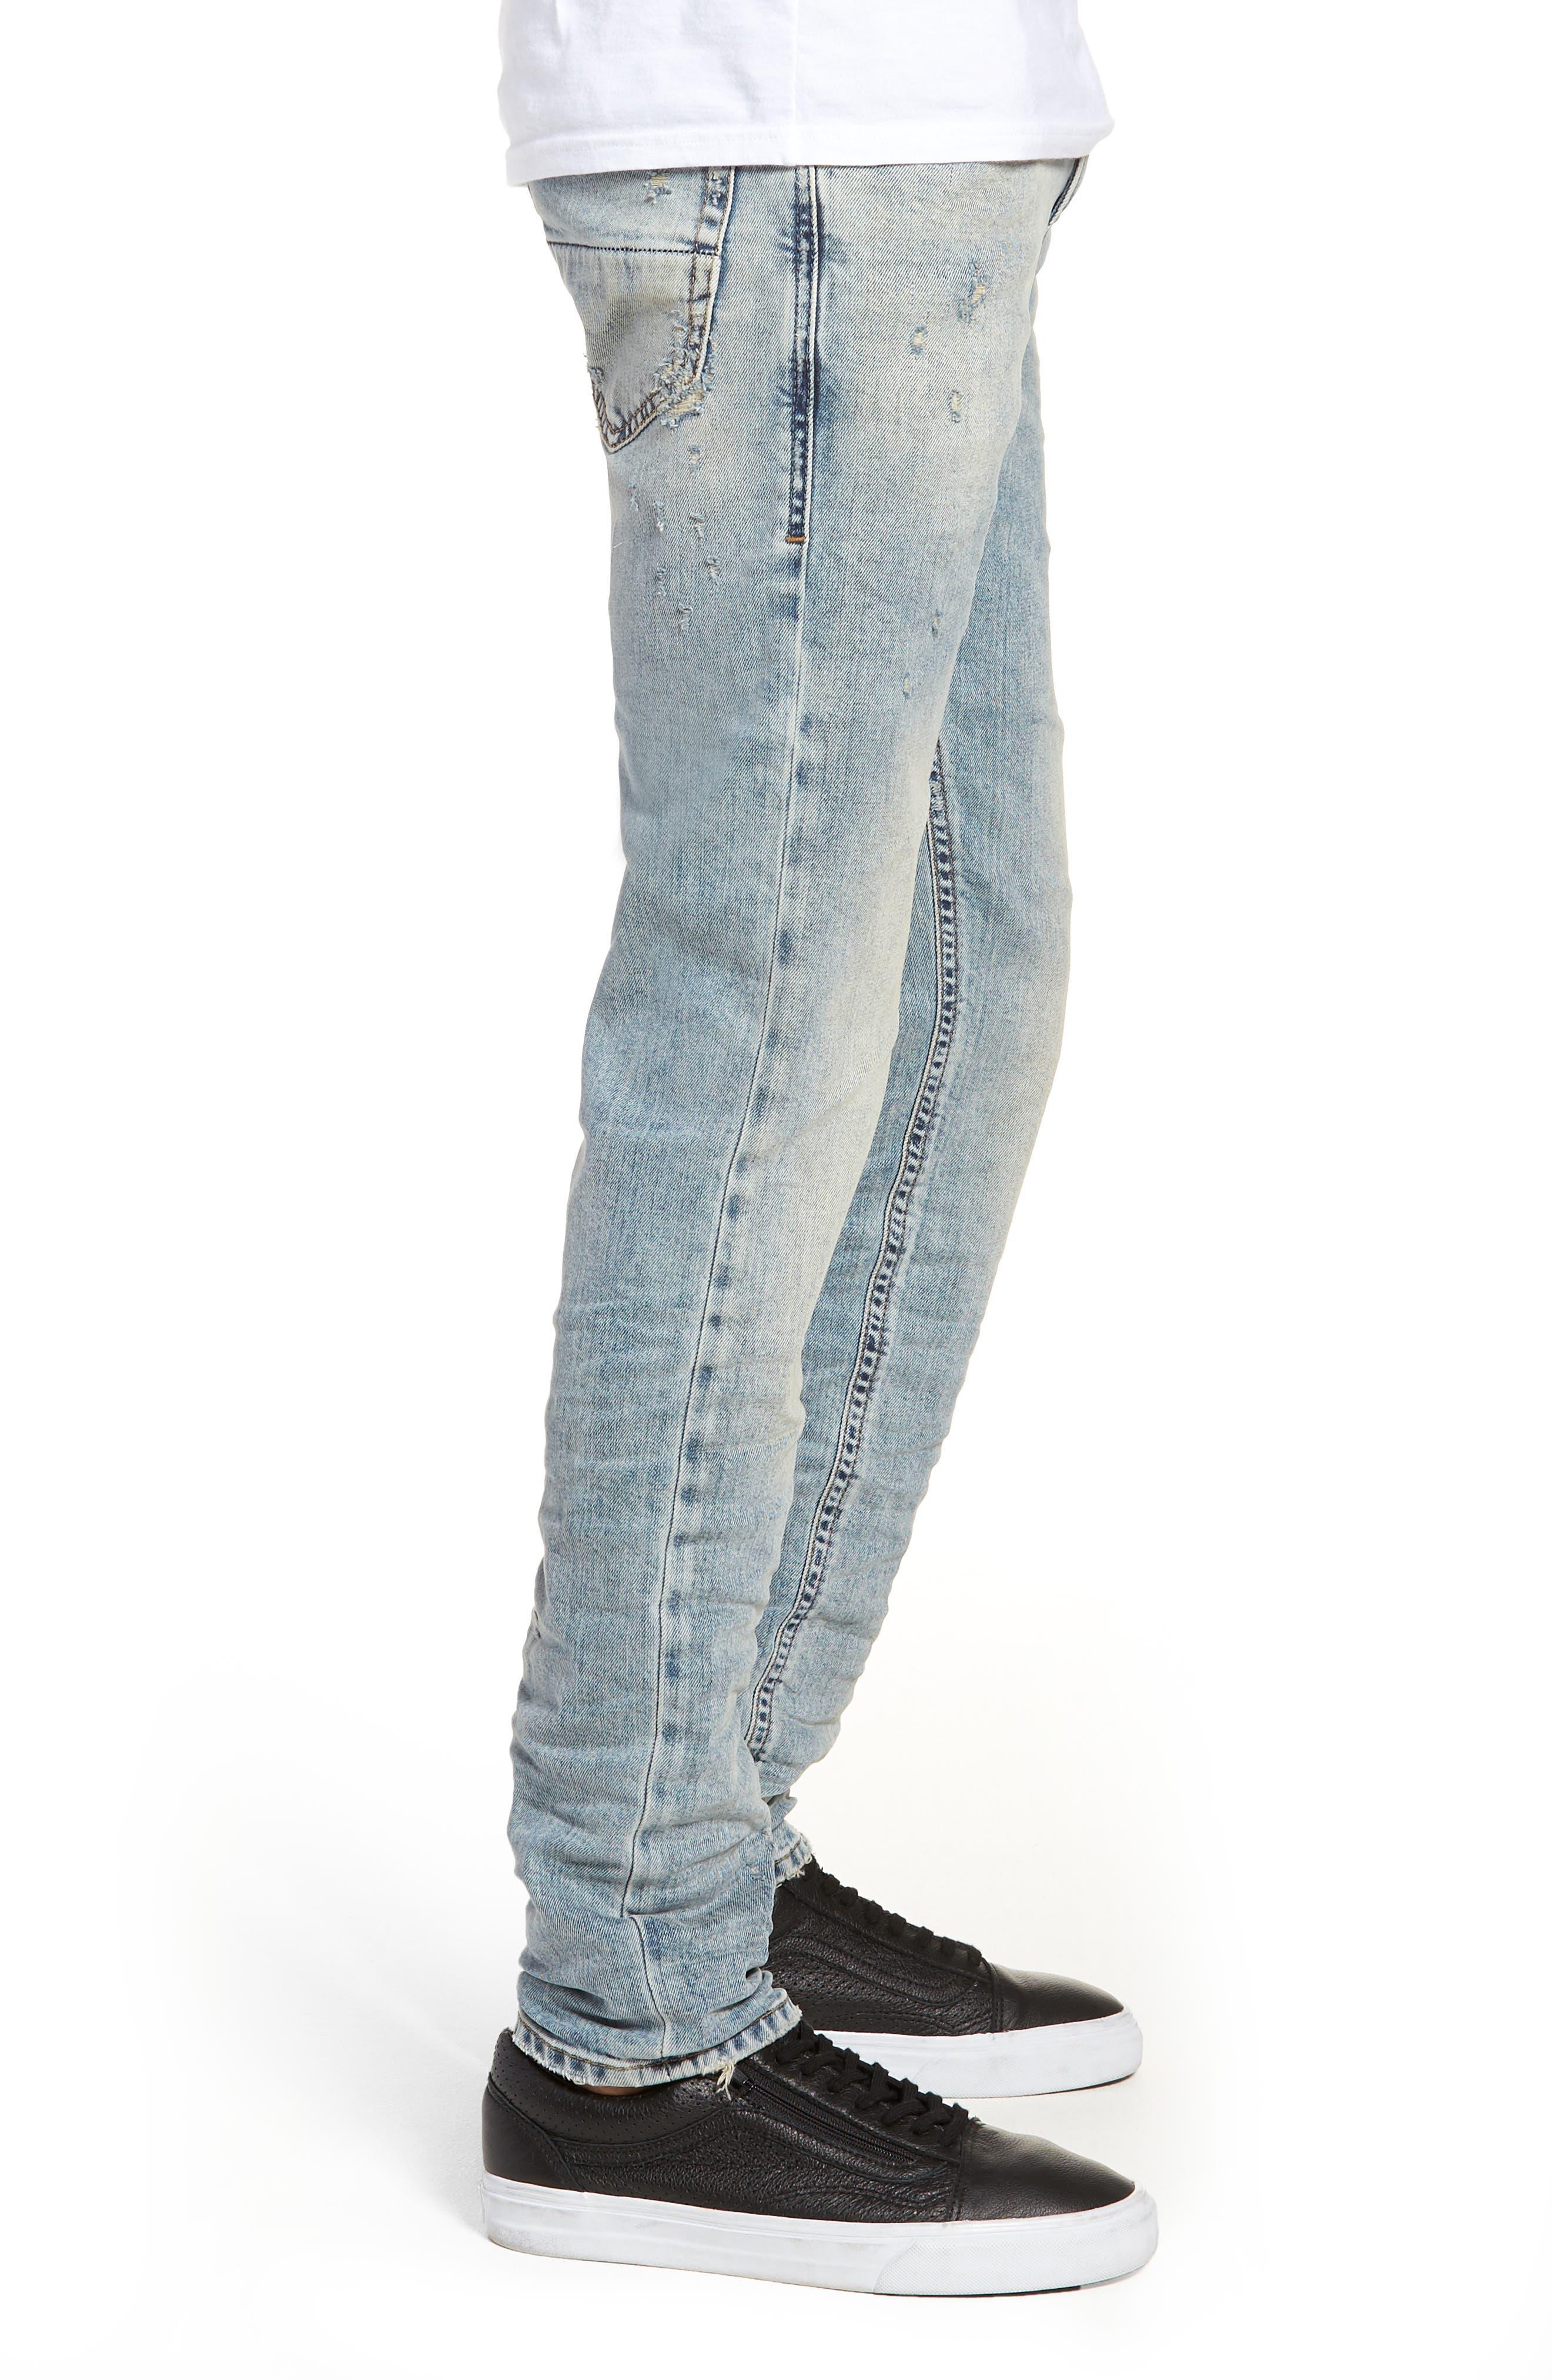 Thommer Skinny Fit Jeans,                             Alternate thumbnail 3, color,                             084Rf